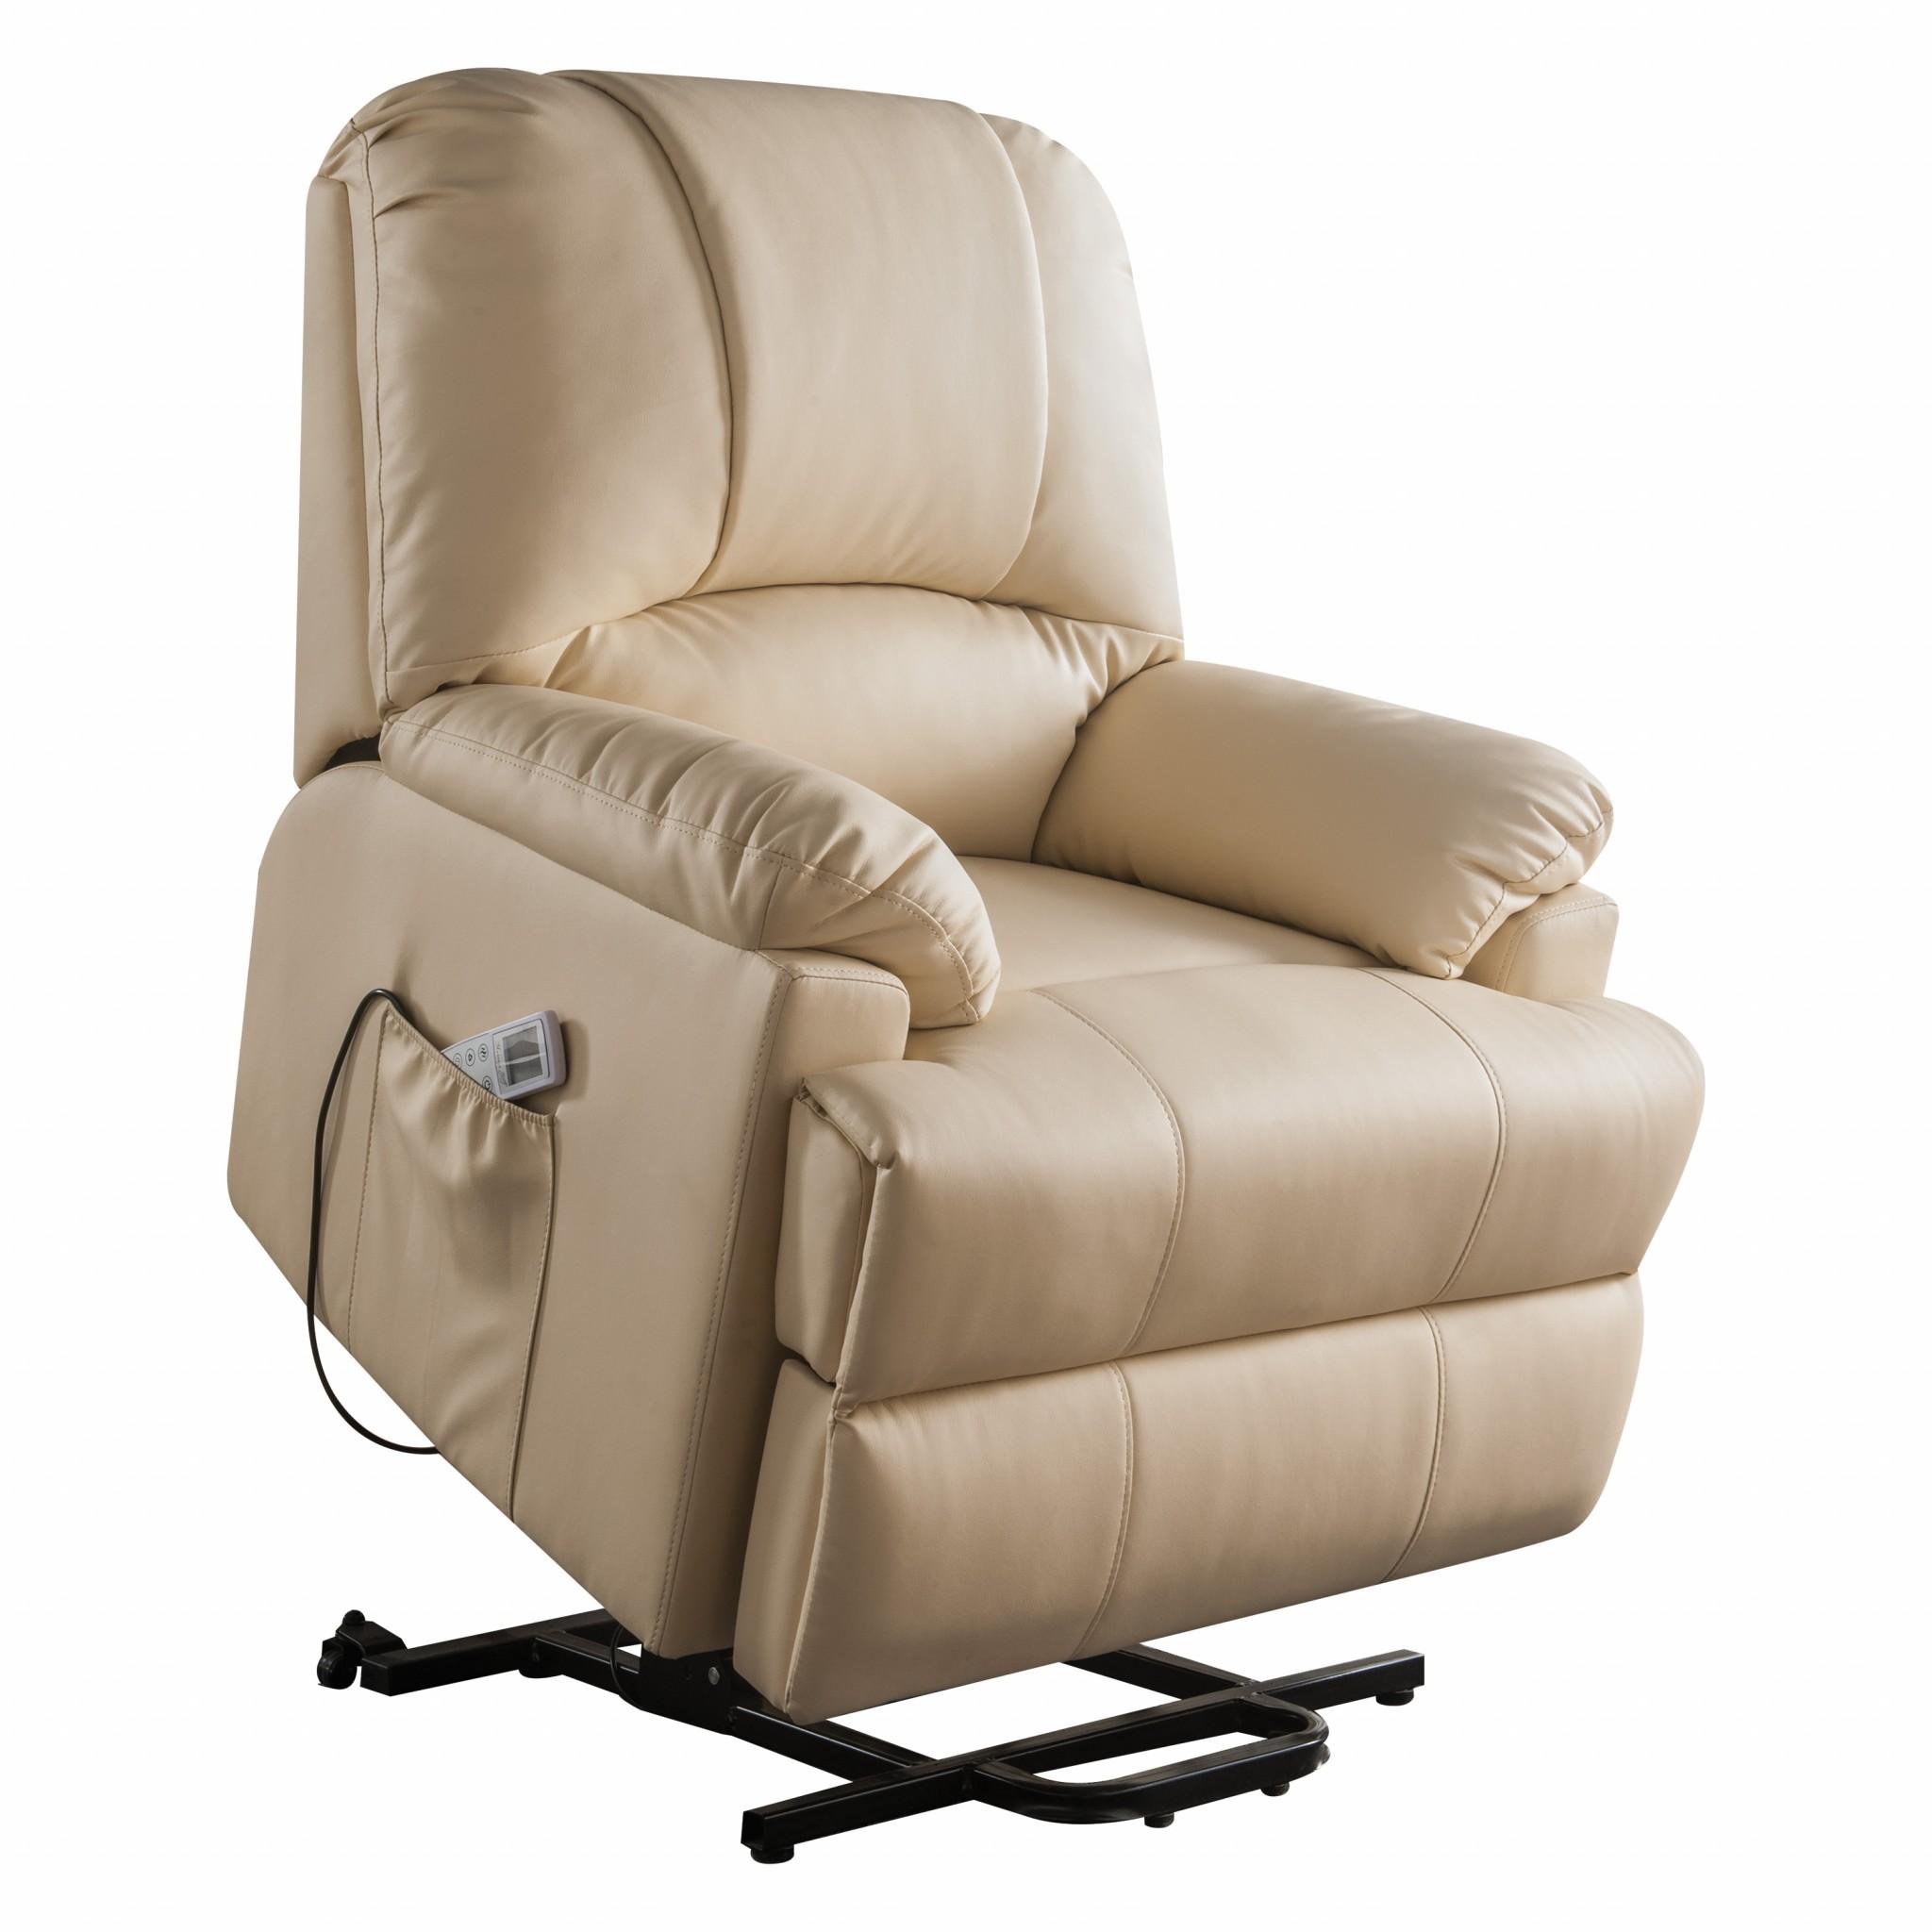 "34"" X 37"" X 41"" Beige Leatherette Power Lift Massage Recliner"